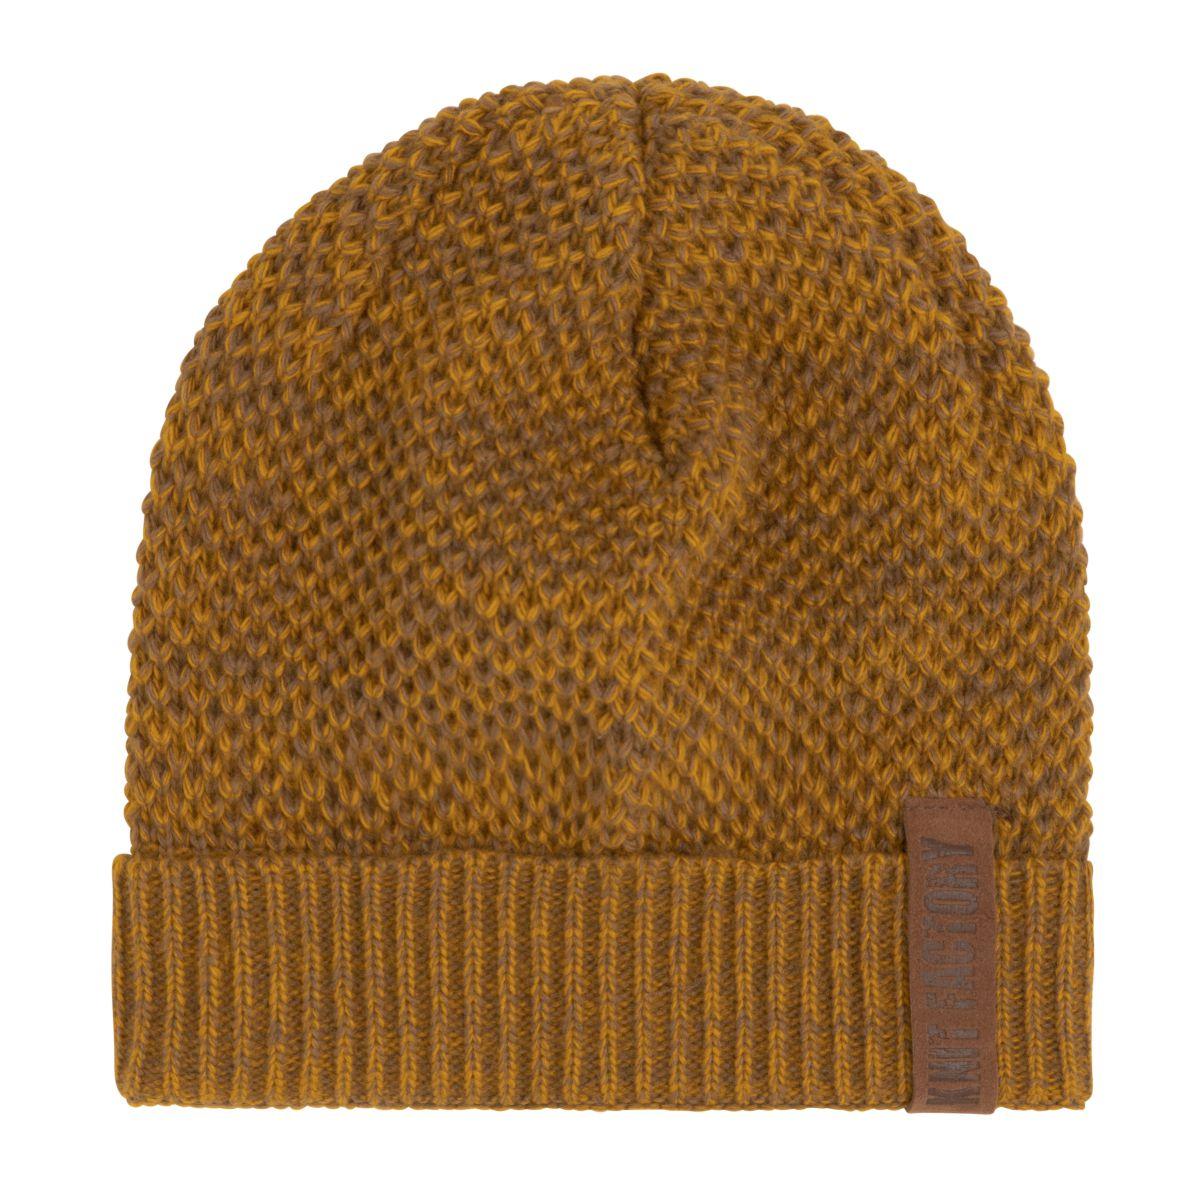 knit factory kf12307008750 jazz muts oker tobacco 1